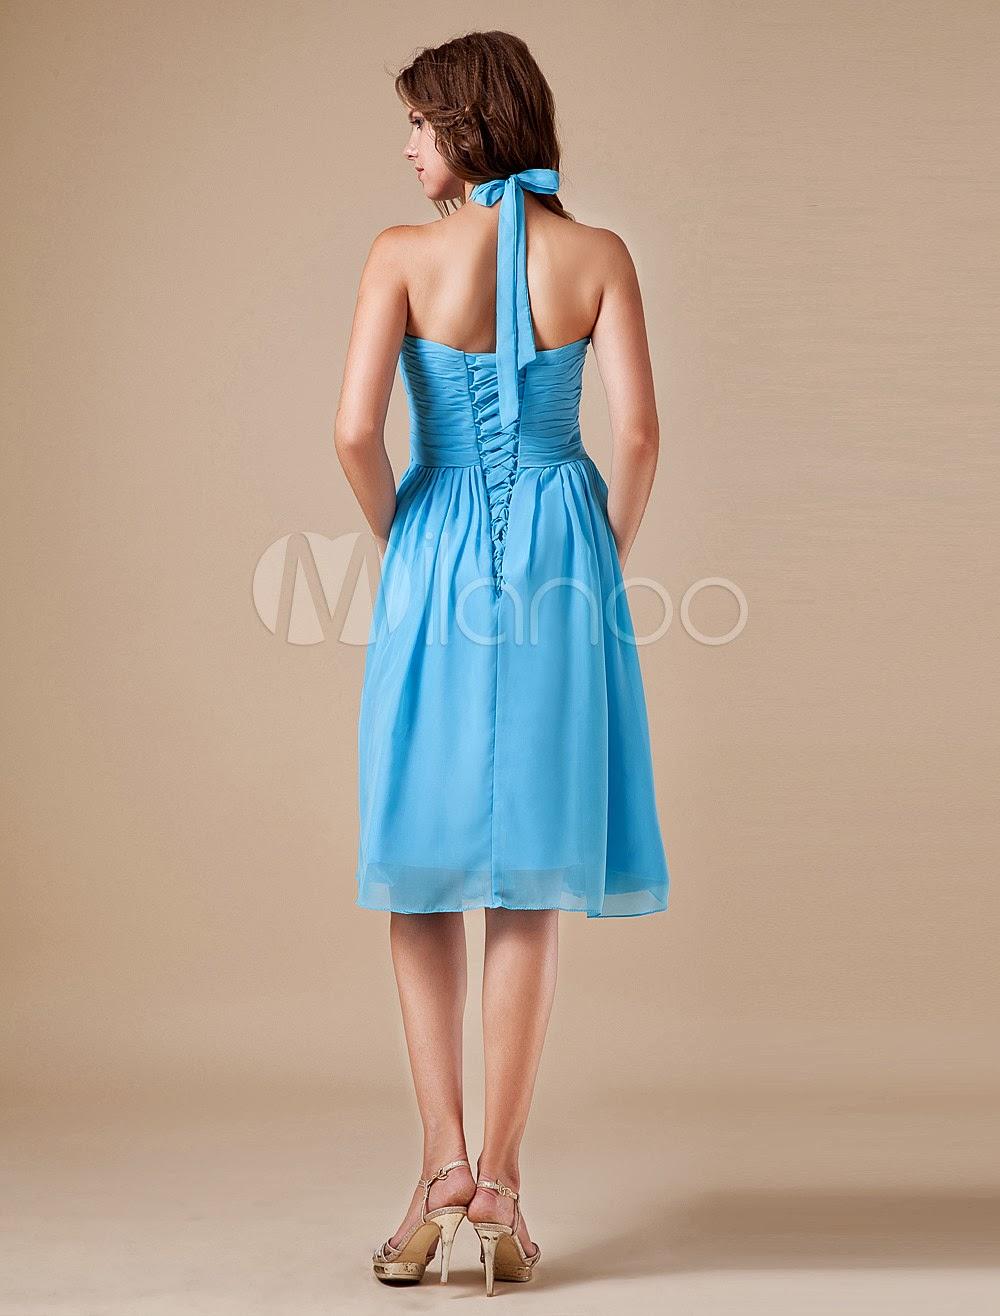 China Wholesale Dresses - Blue Halter Chiffon Knee Length Womens Bridesmaid Dress